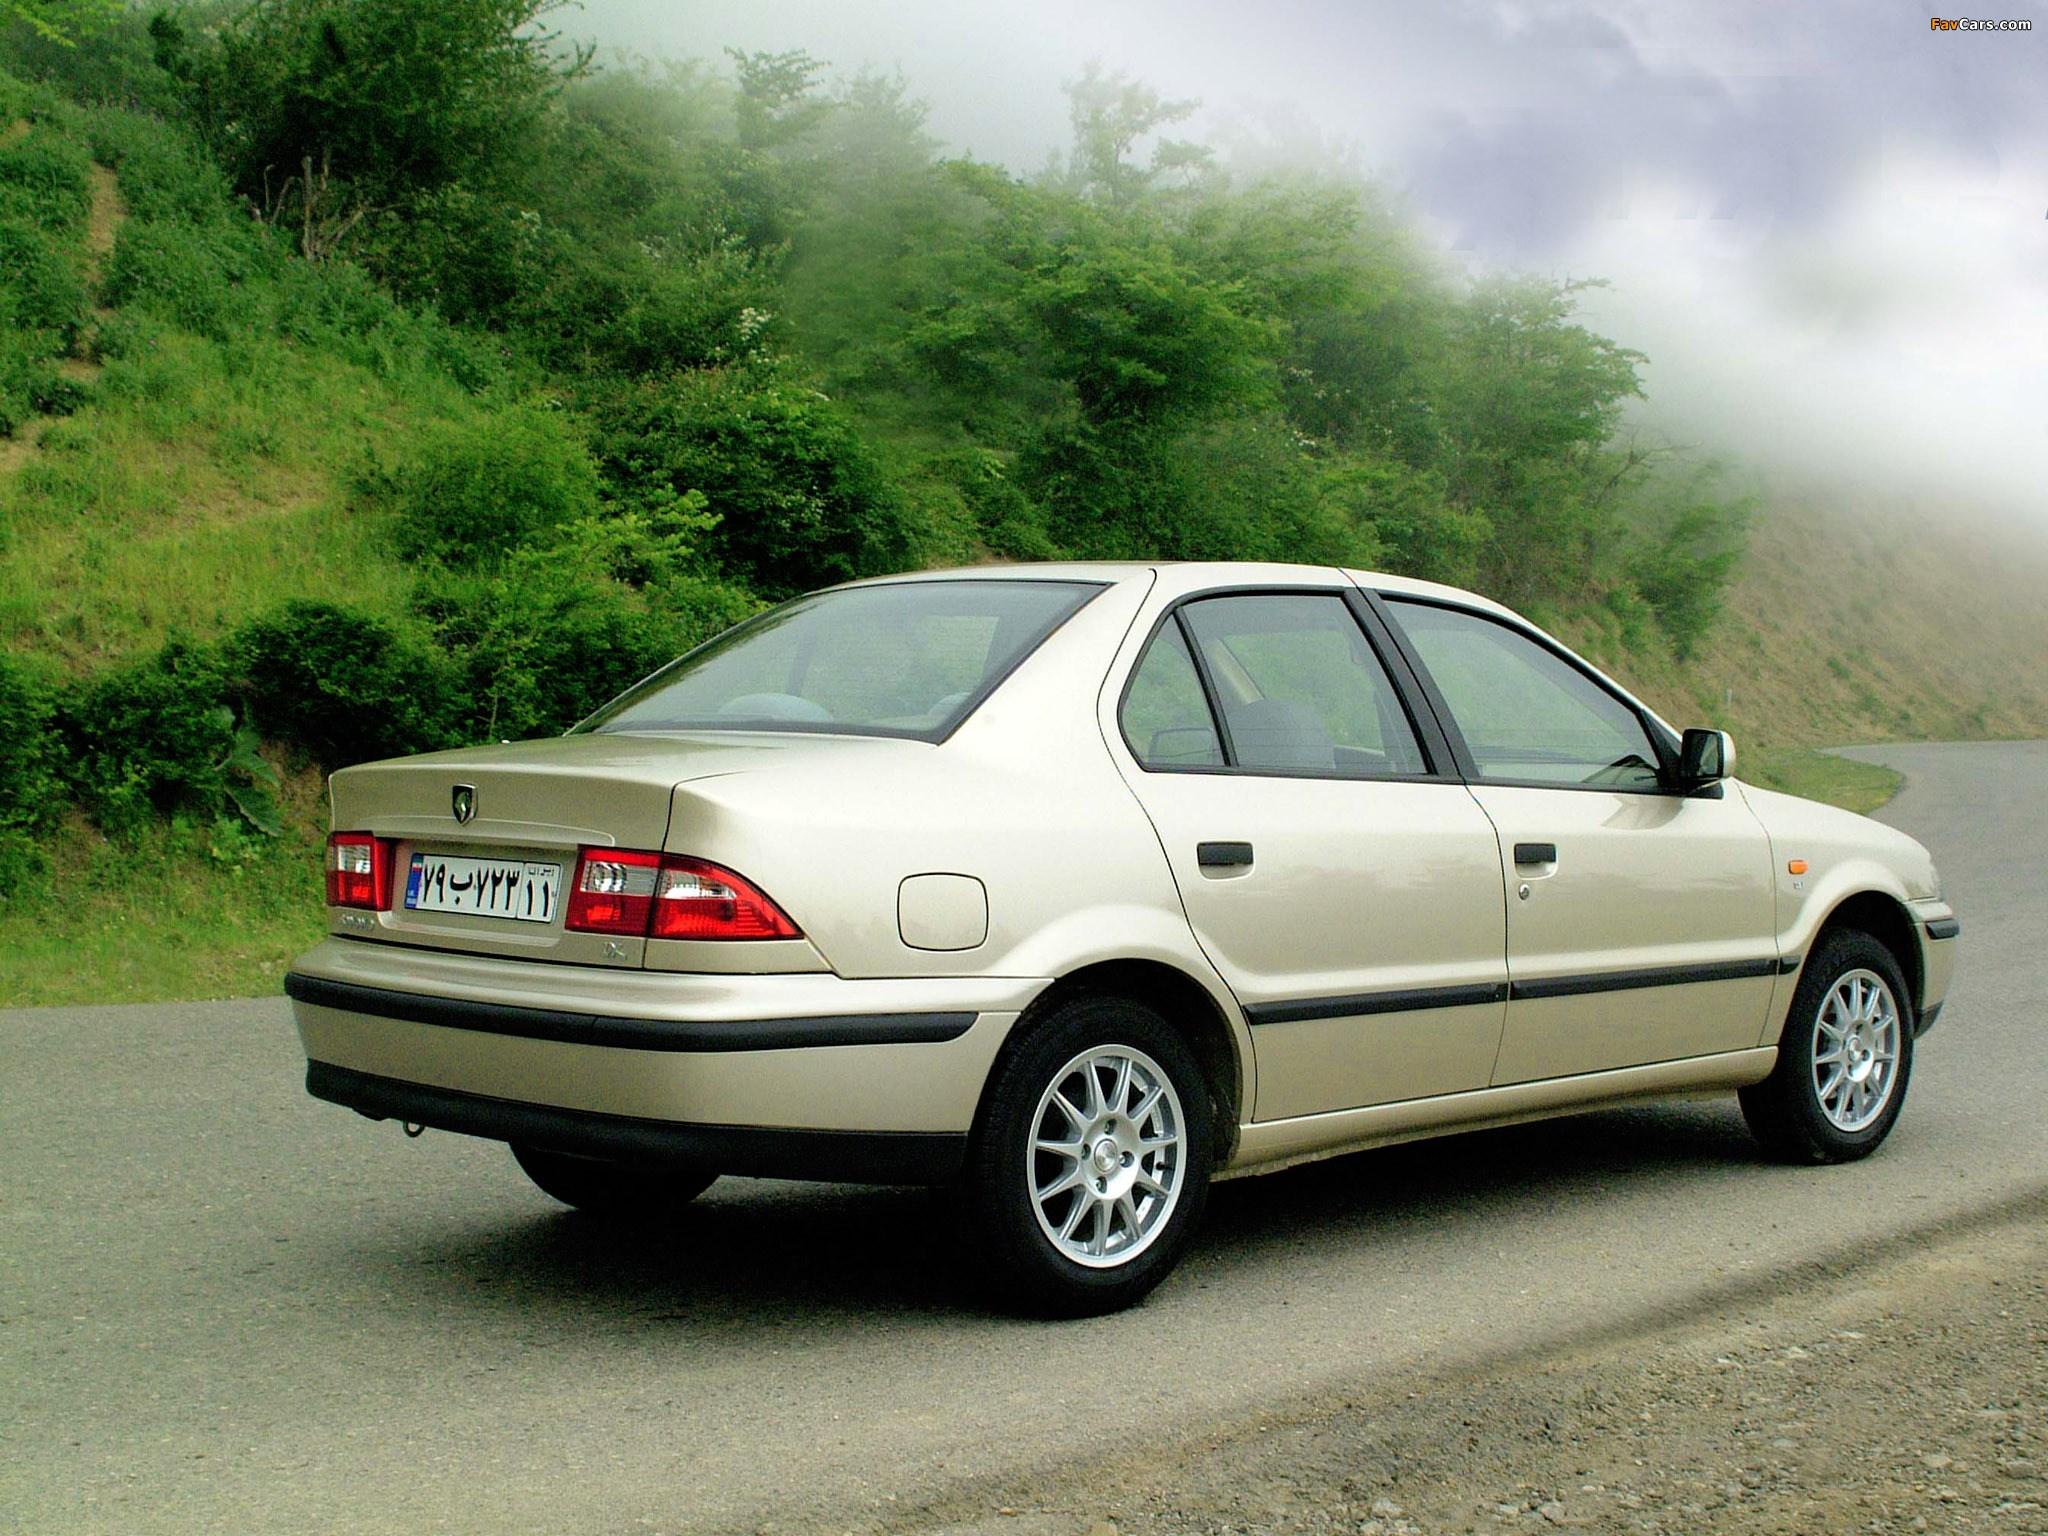 Iran Khodro Samand 2002 - now Sedan #3